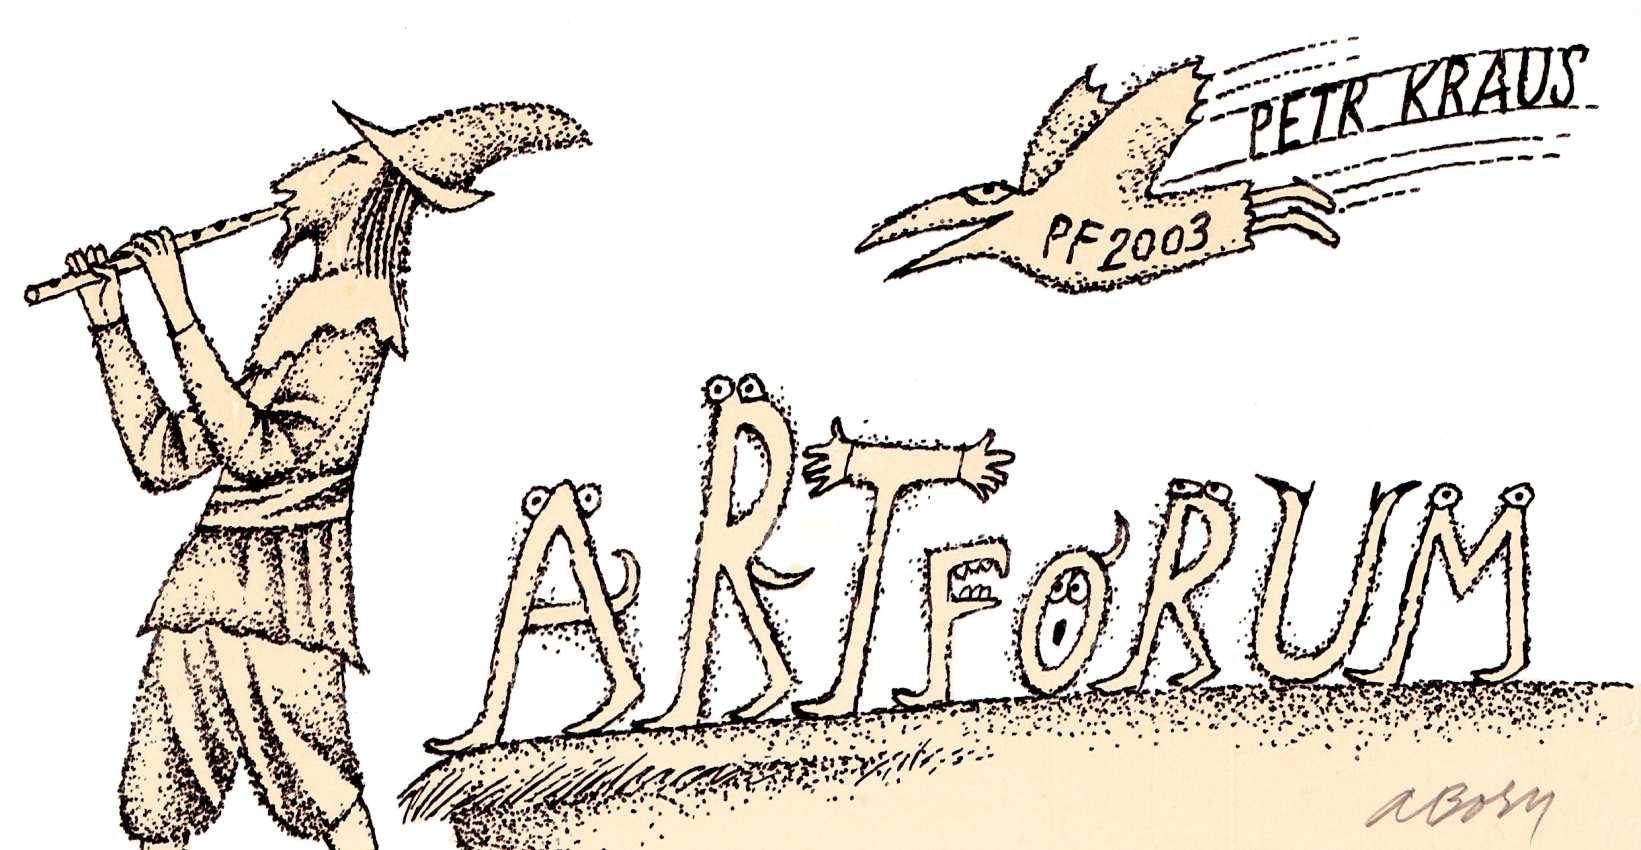 Adolf Born: PF 2003 Oficiální zdroj: ArtFrum